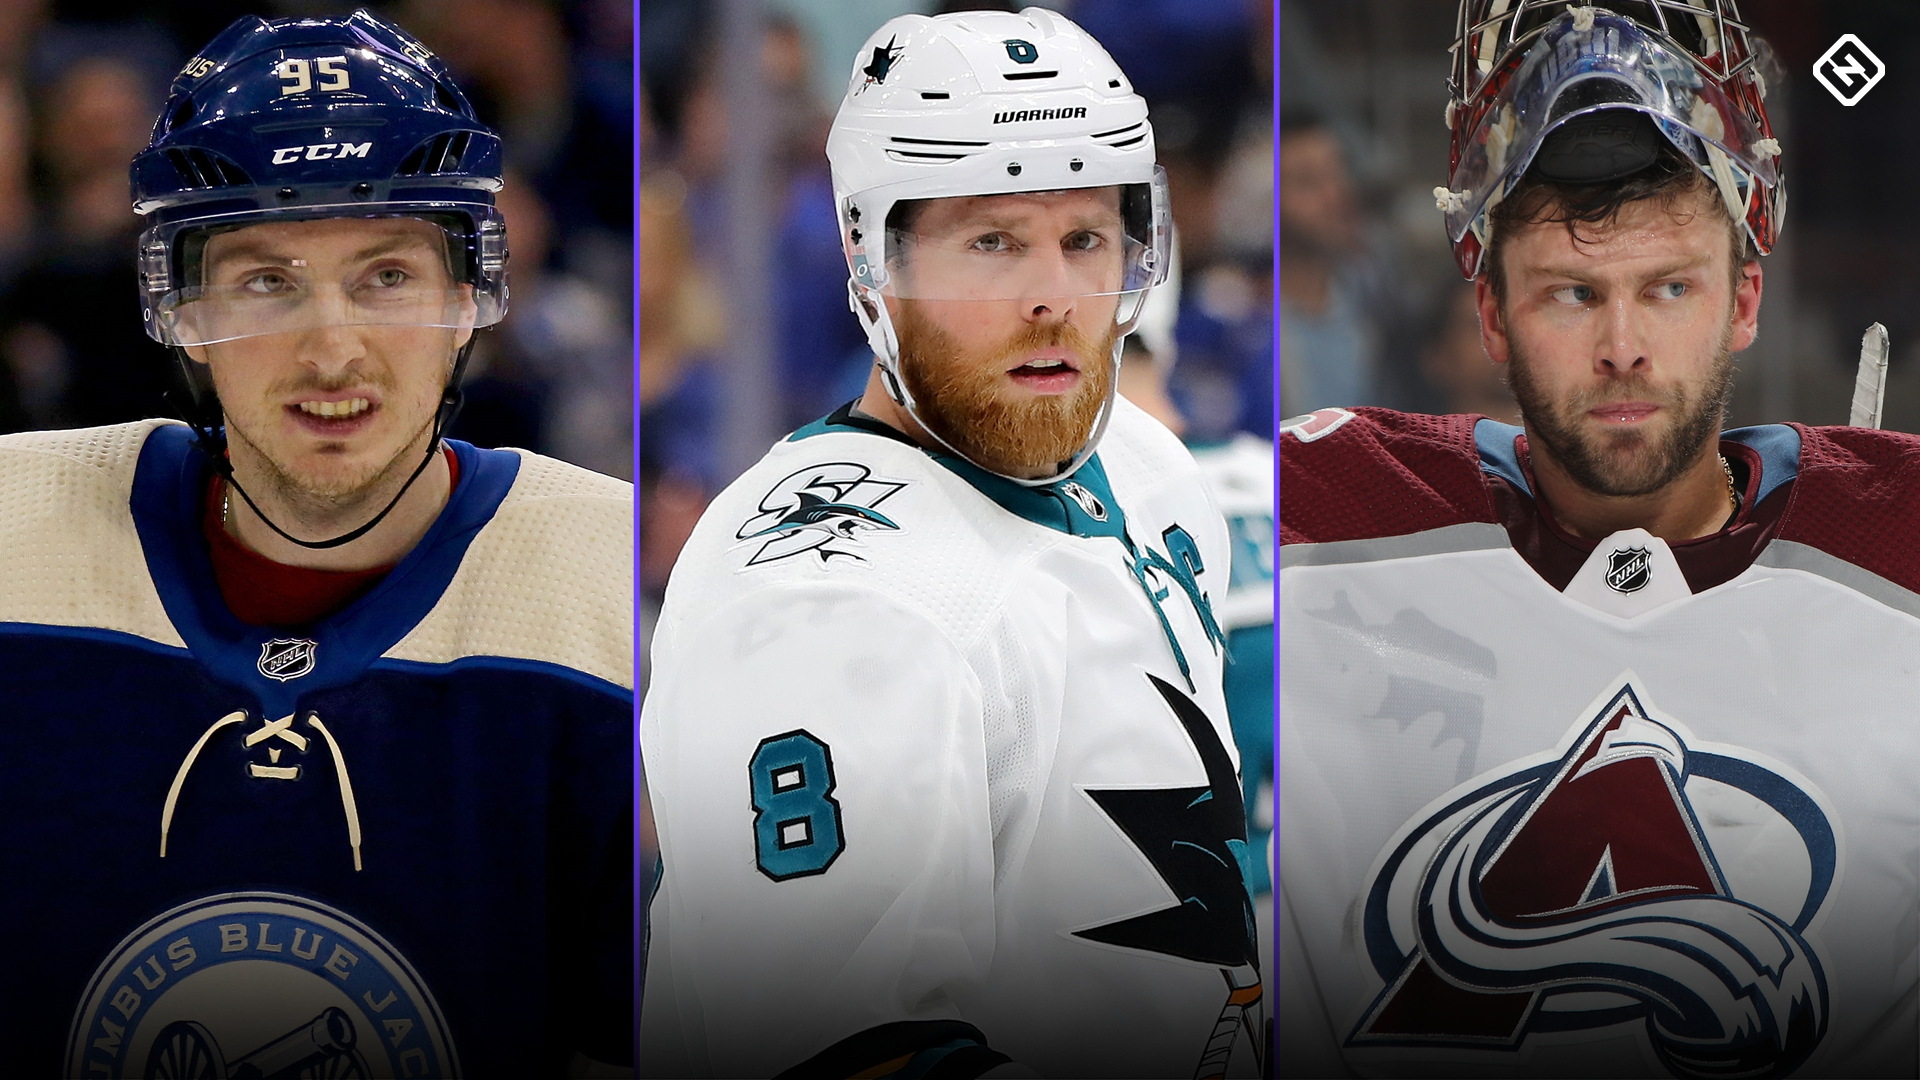 Duchene, Pavelski, Varlamov and the best worst NHL UFA signings